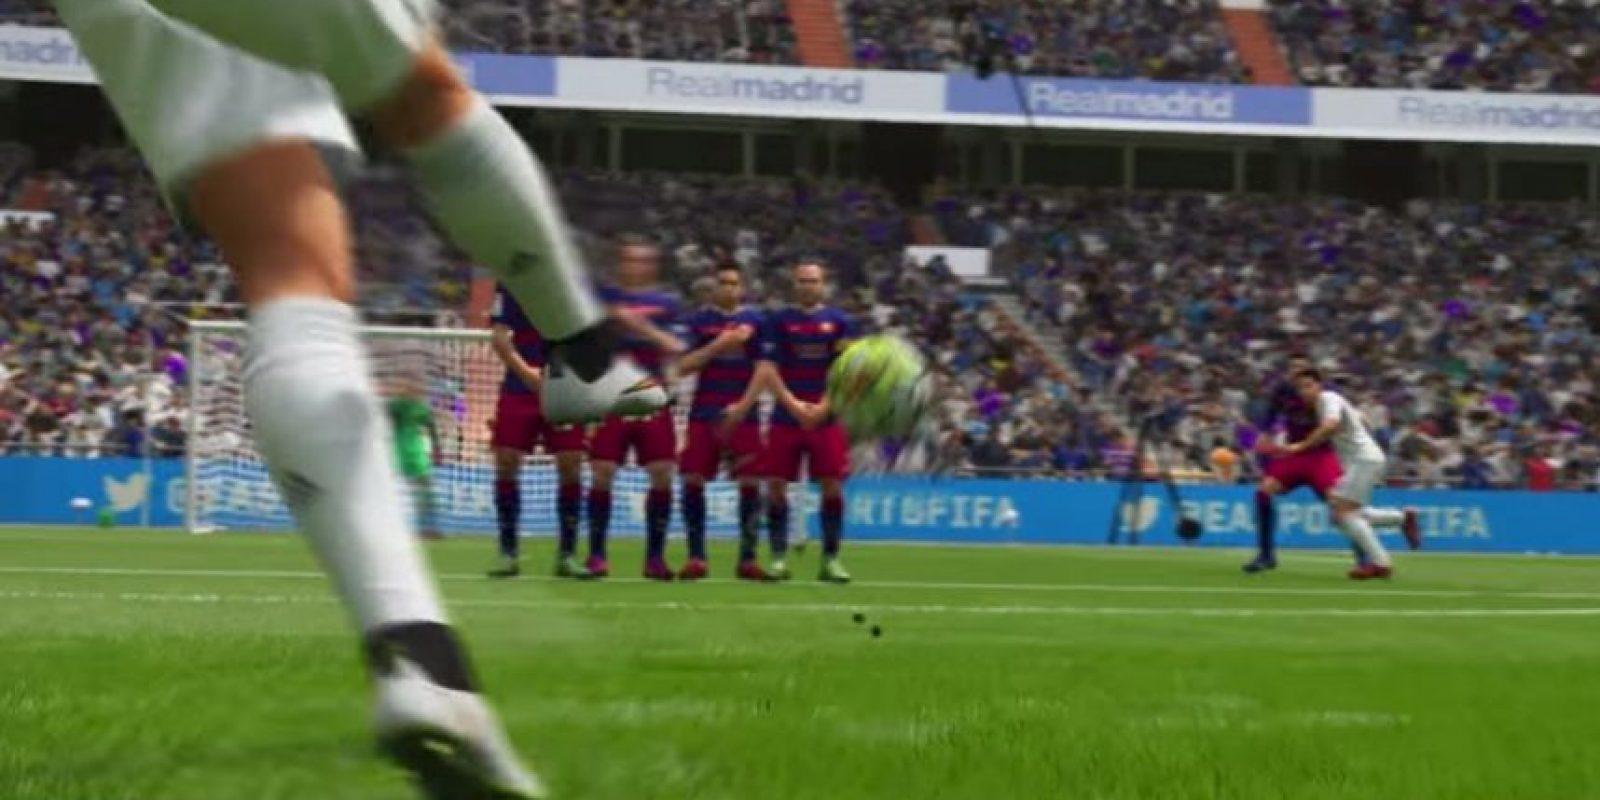 Tiro libre de Cristiano Ronaldo en el FIFA 16. Foto:EA Sports